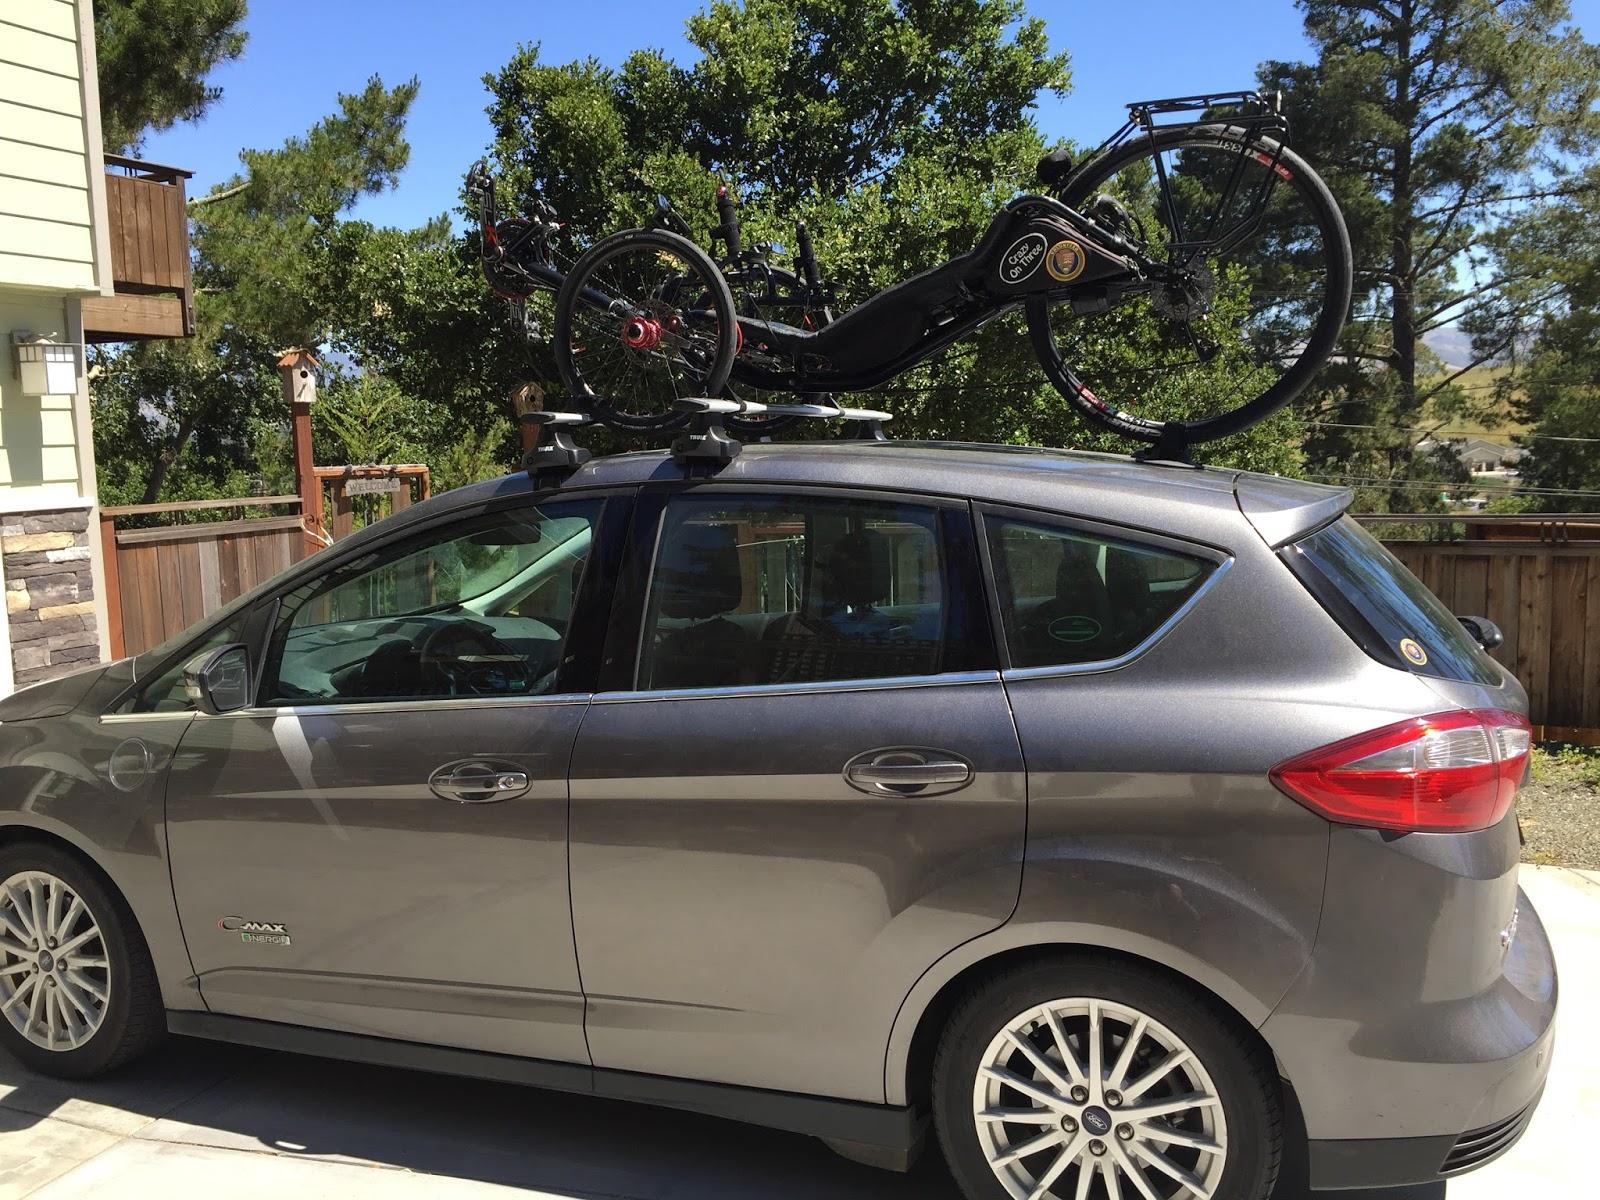 my bent up cycling journal..: thule roof rack, seasucker and trike